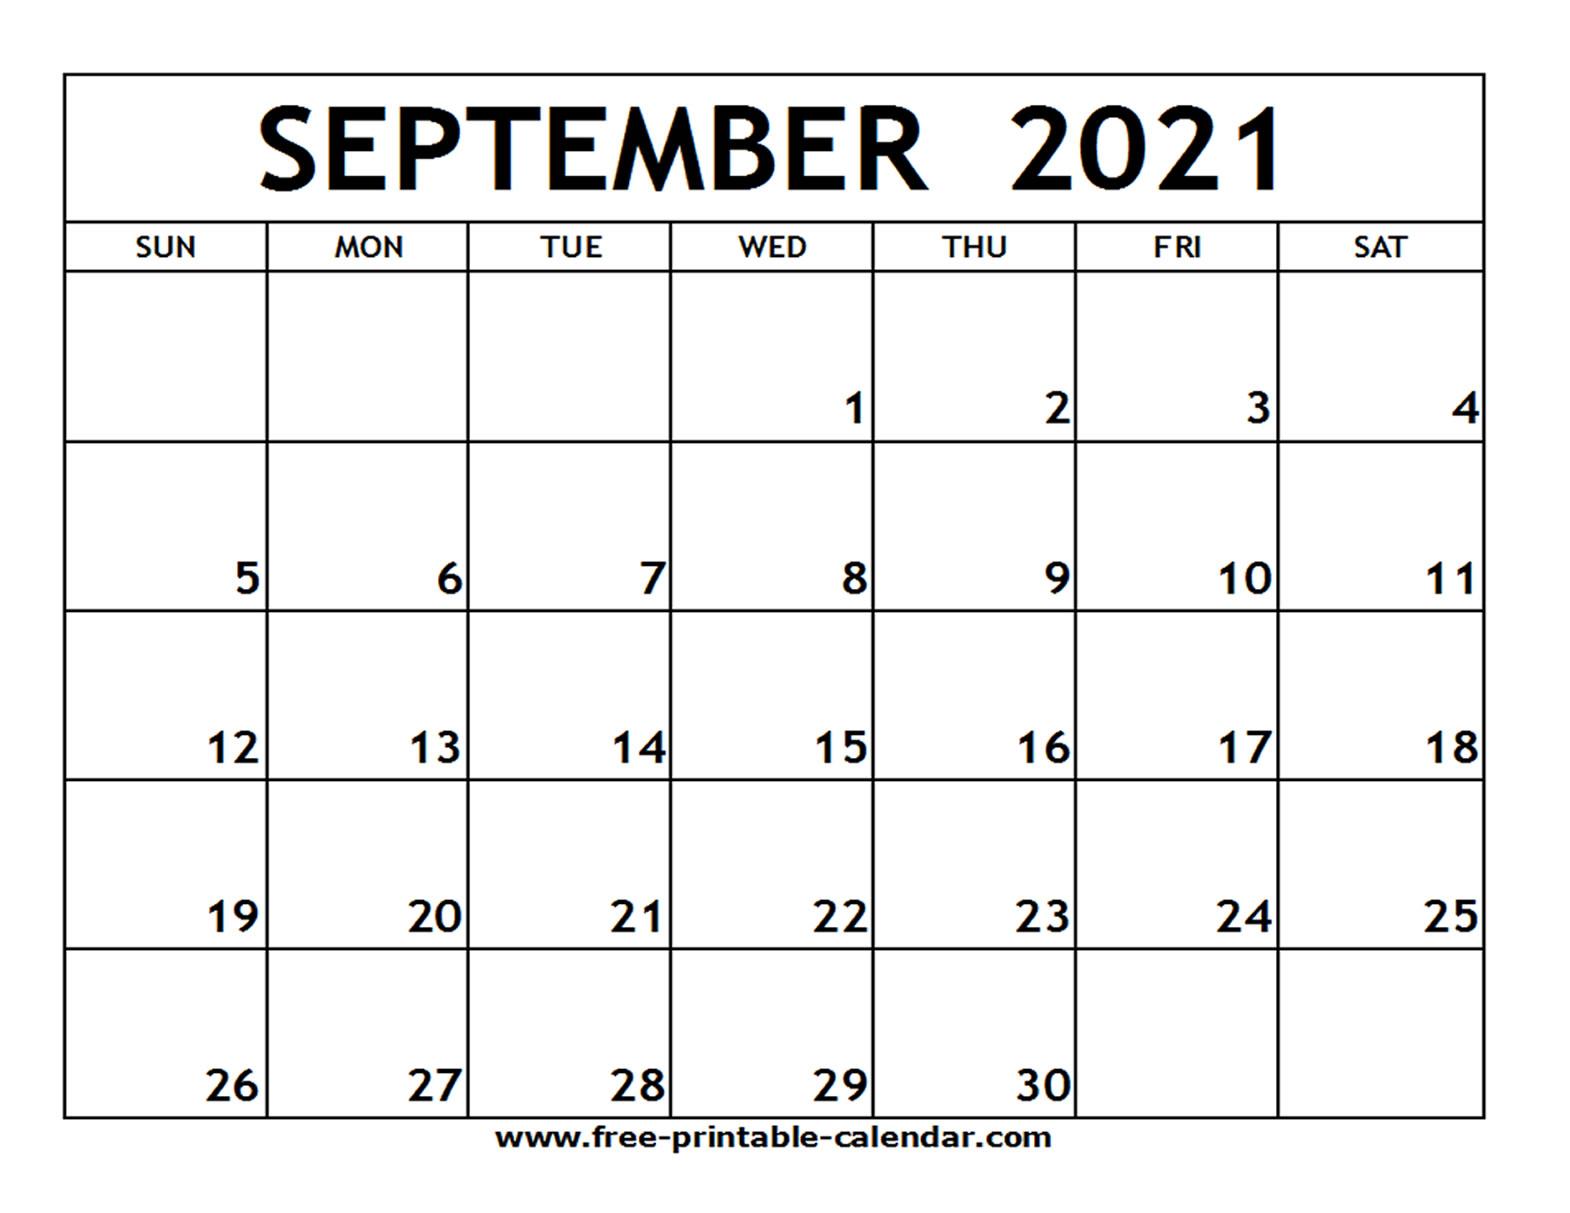 September 2021 Printable Calendar - Free-Printable-Calendar